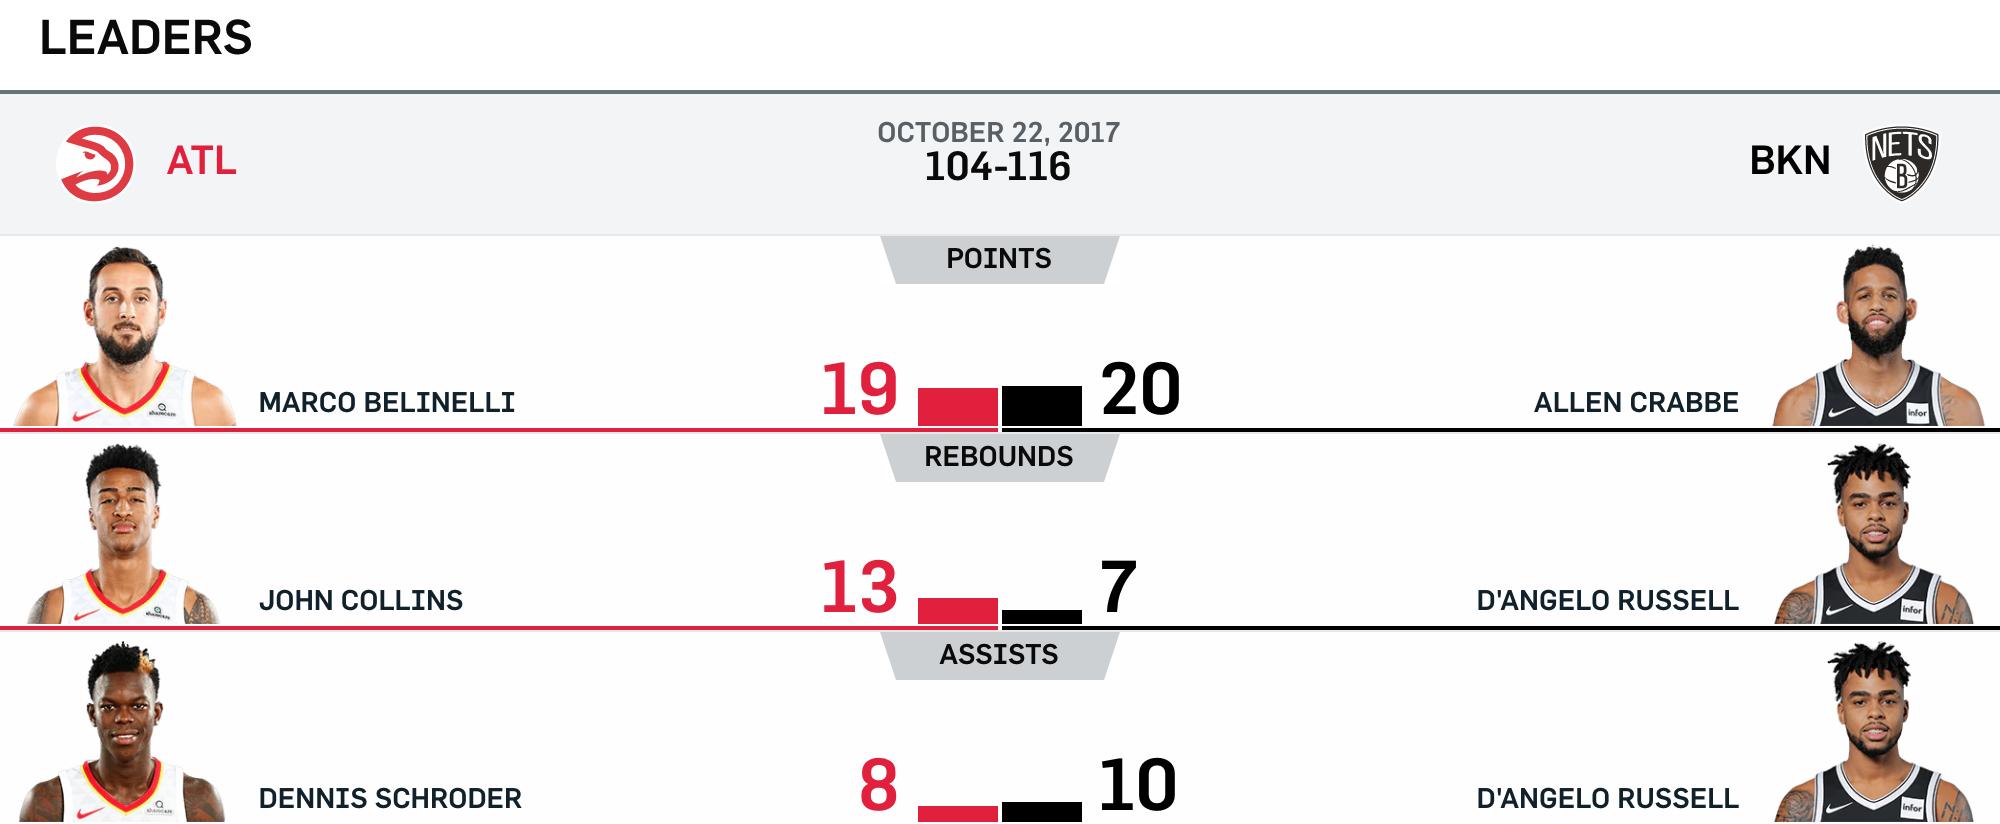 Nets vs Hawks 10-22-17 Leaders